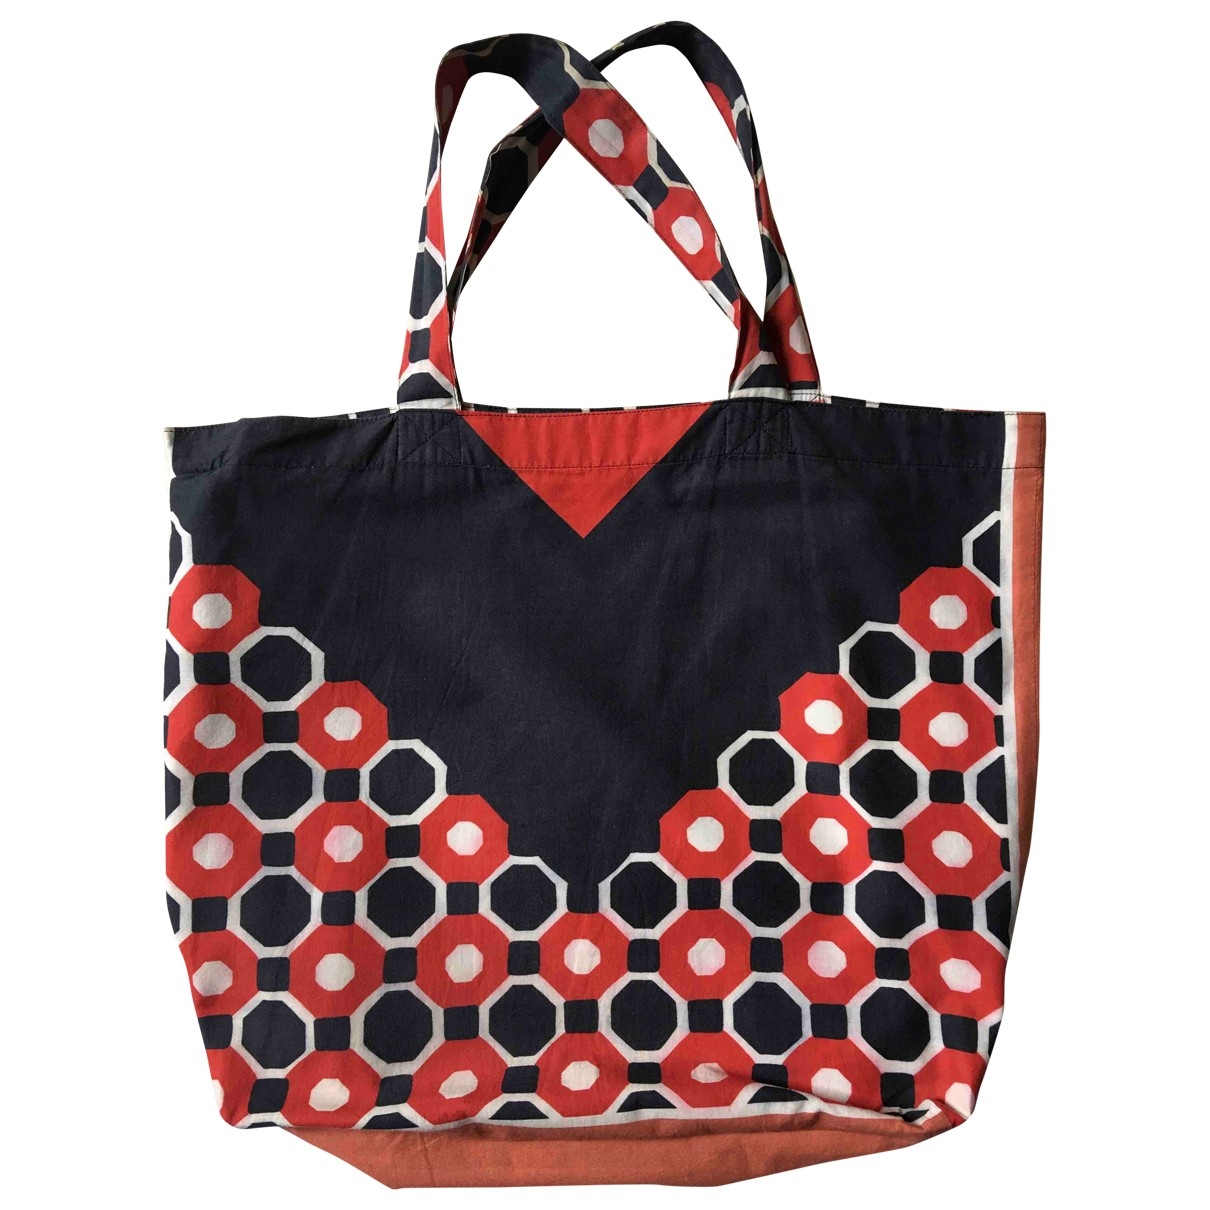 Marni \N Multicolour Cotton handbag for Women \N